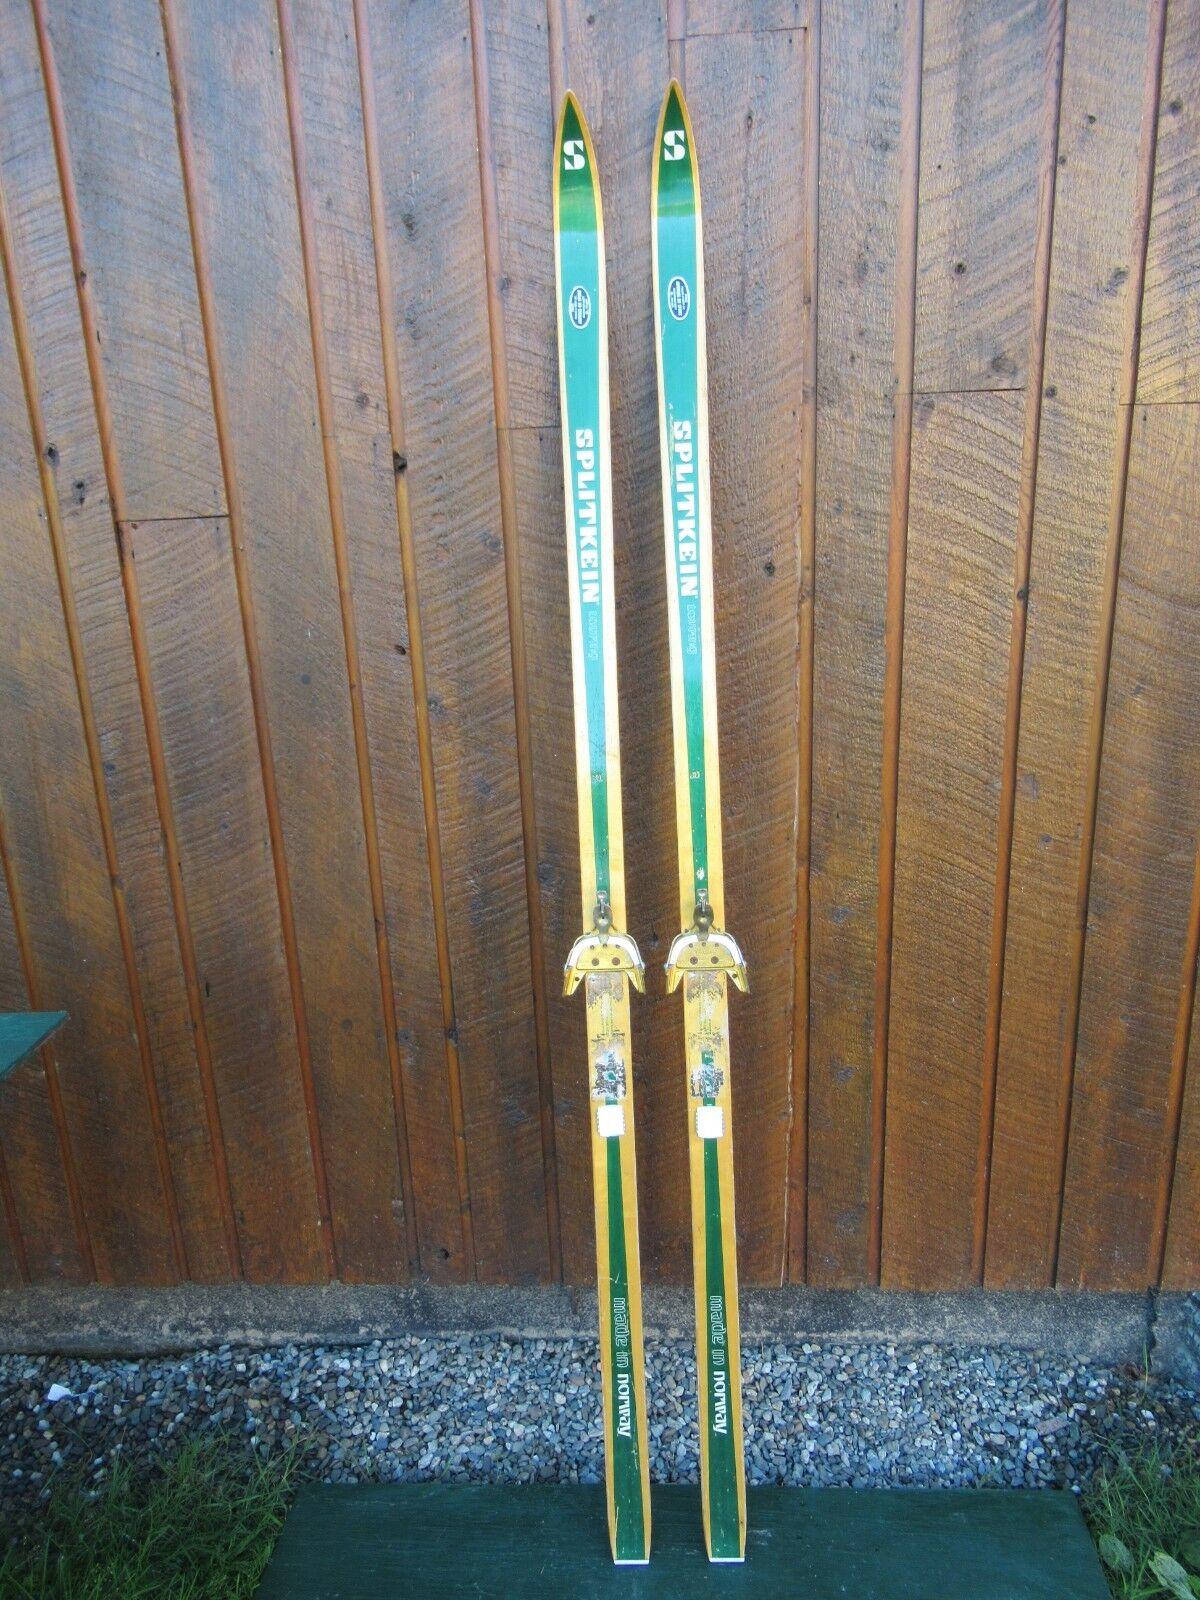 Vintage Wooden Skis 73  Long Has Original Green Brown Finish and Bindings